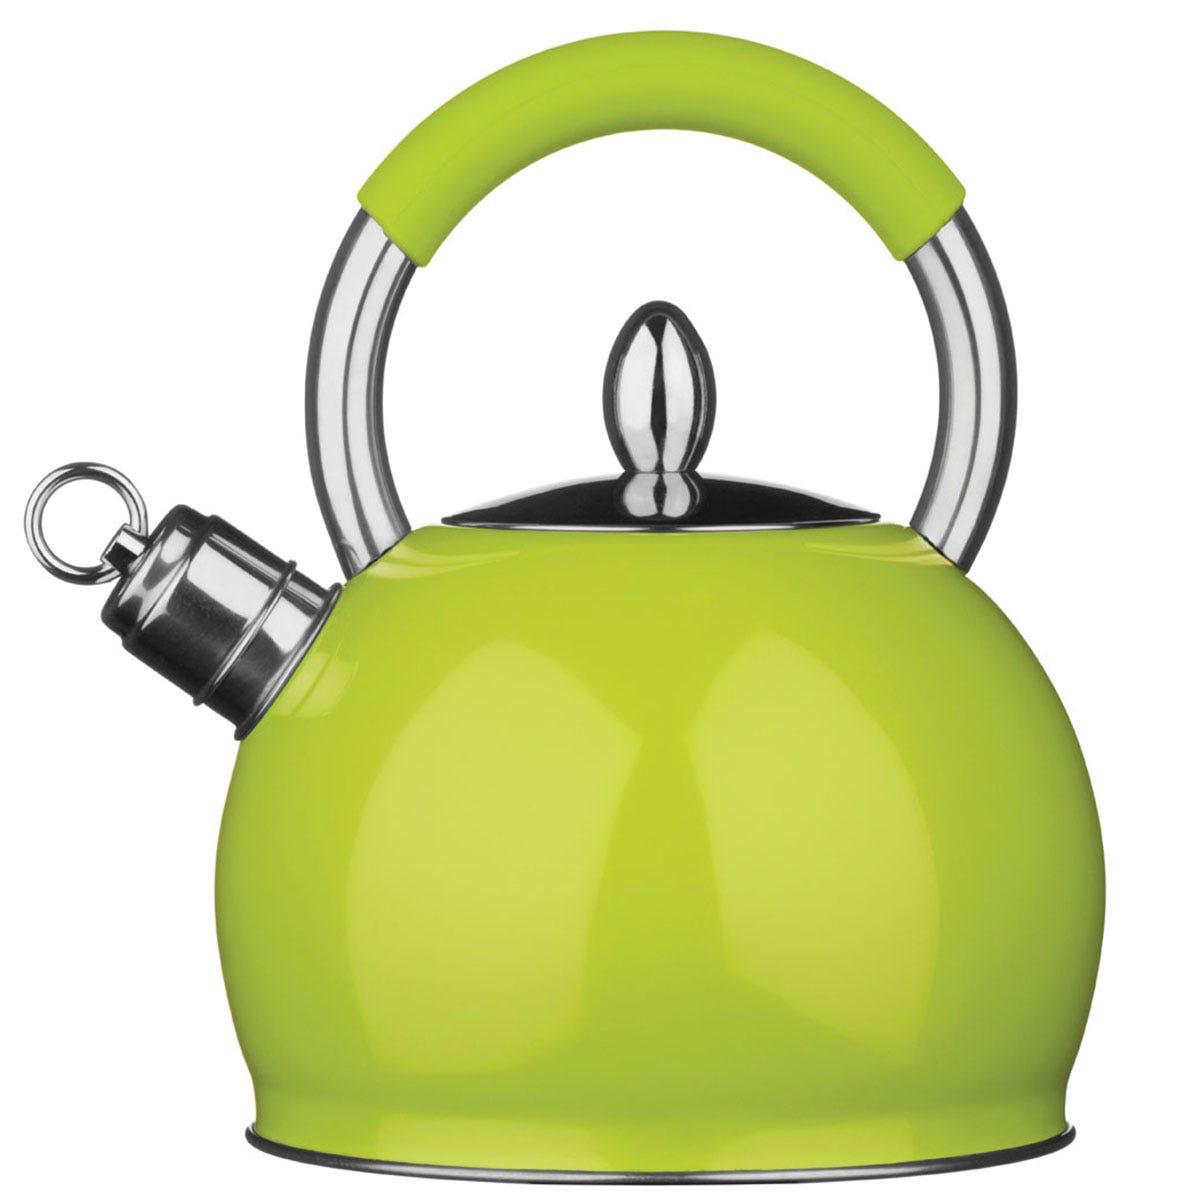 Premier Housewares 2.4L Stainless Steel Whistling Kettle - Lime Green